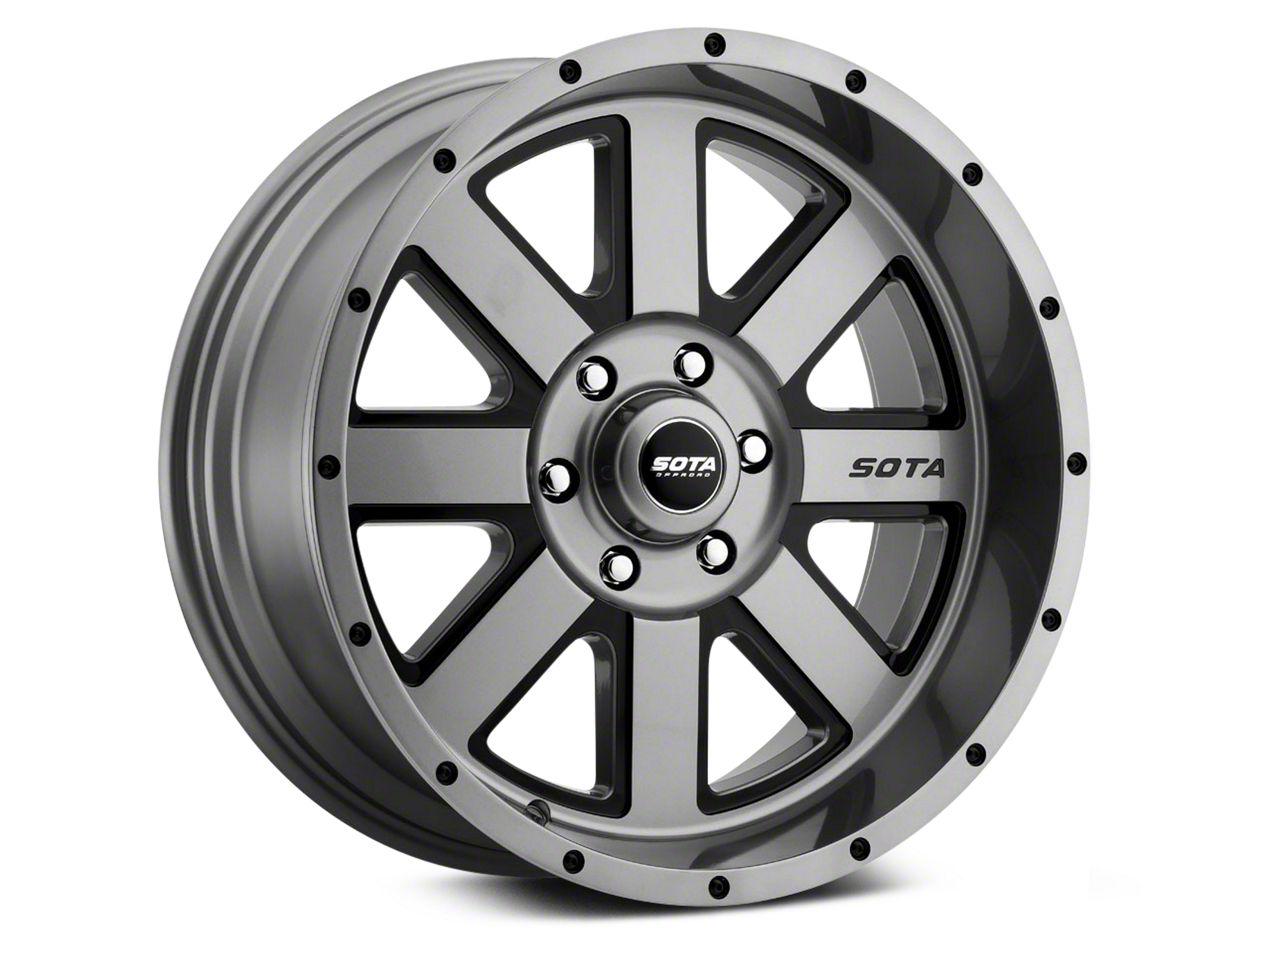 SOTA Off Road AWOL Anthra-Kote Black 6-Lug Wheel - 22x12 (07-18 Sierra 1500)